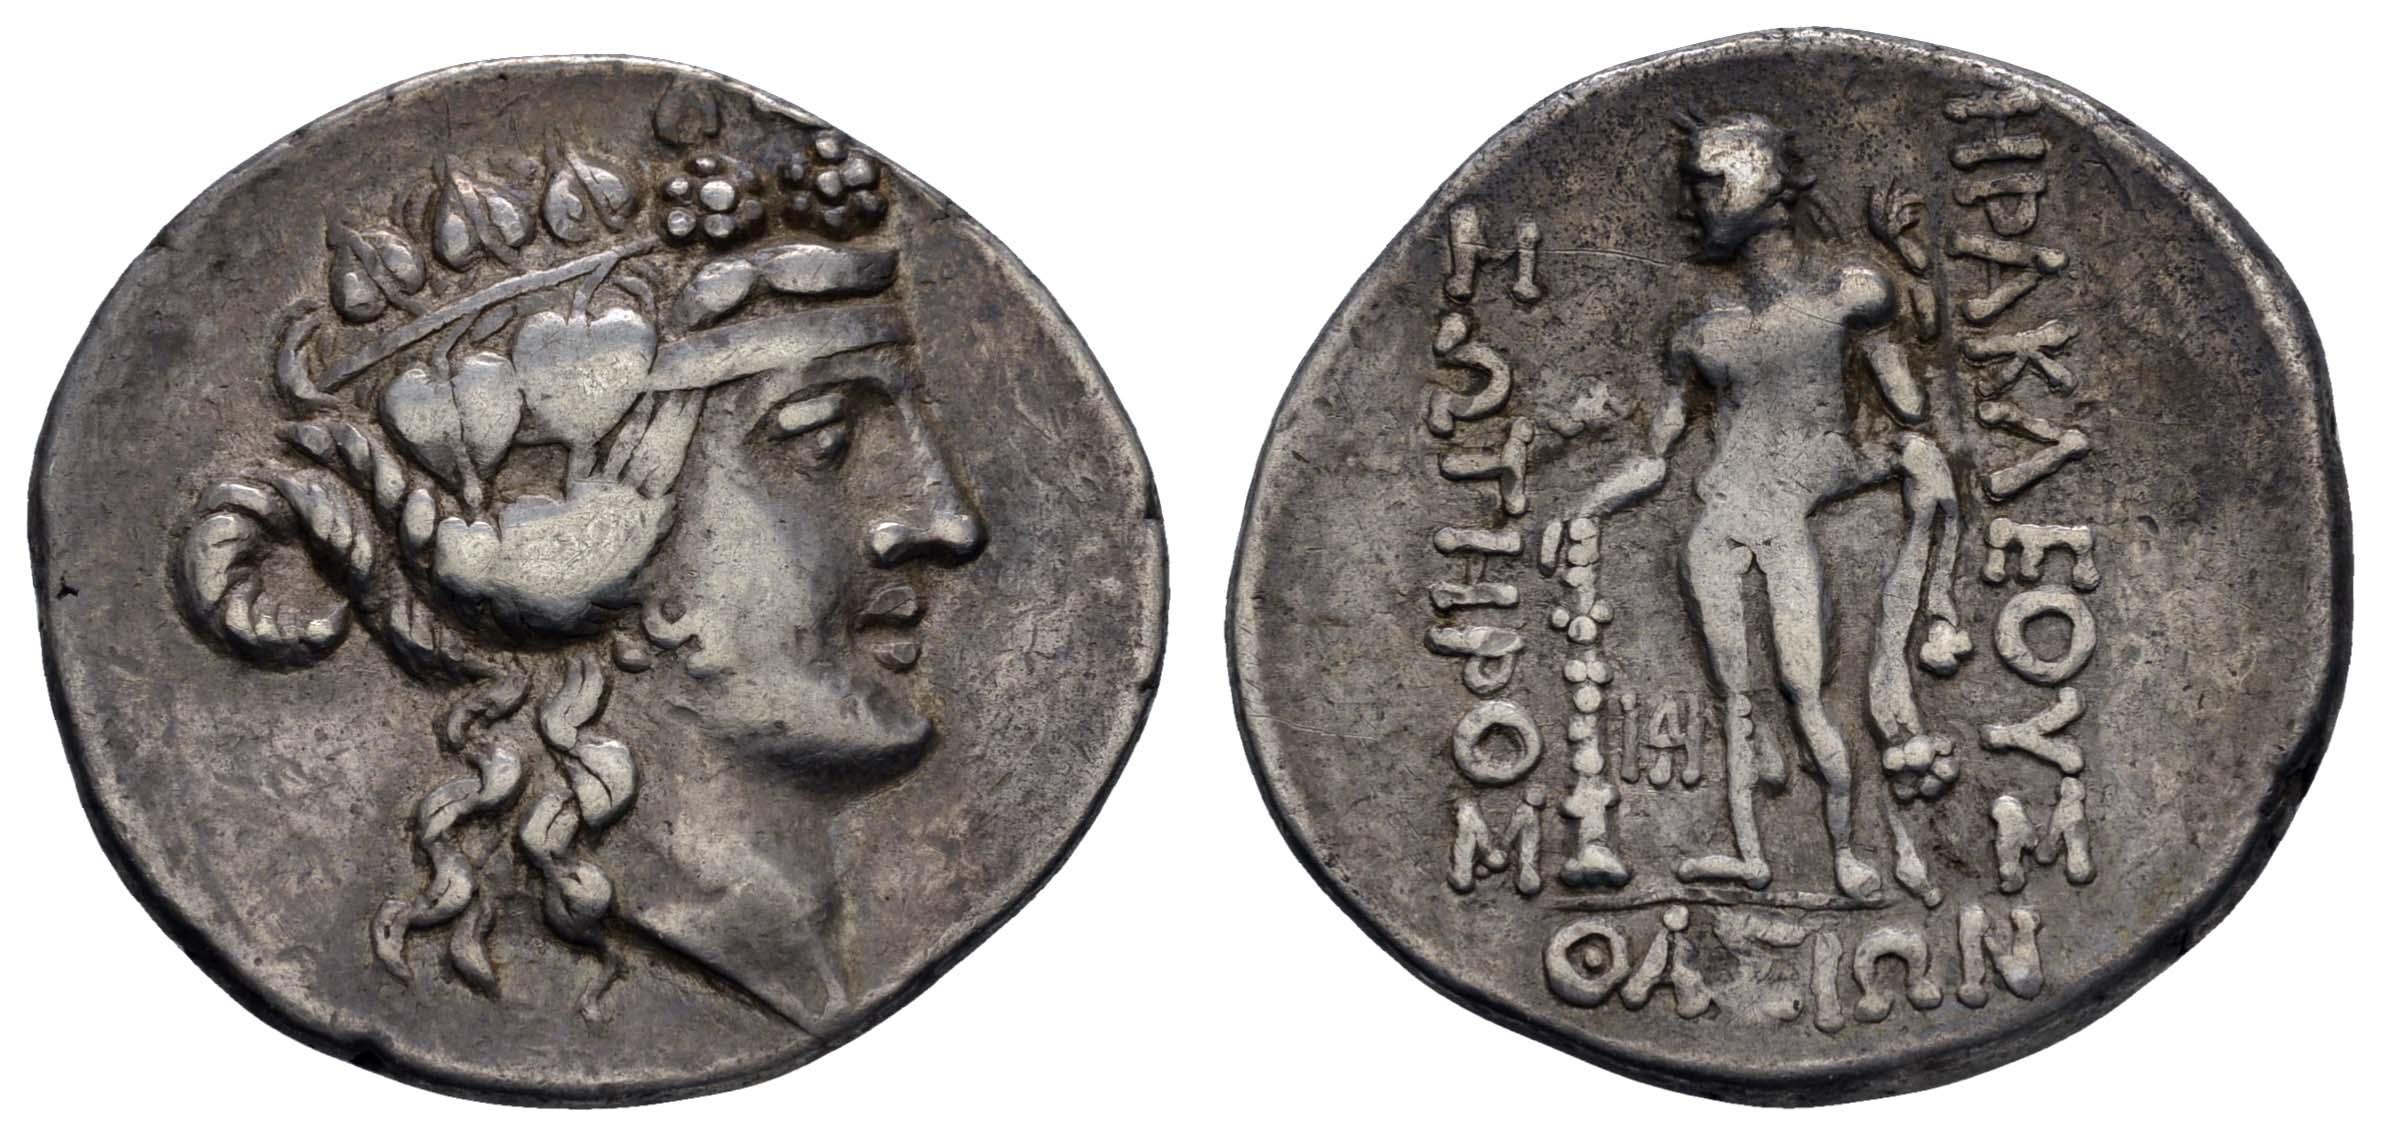 Lot 20 - Antike Griechen - Thracia -  Auktionshaus Ulrich Felzmann GmbH & Co. KG Coins single lots